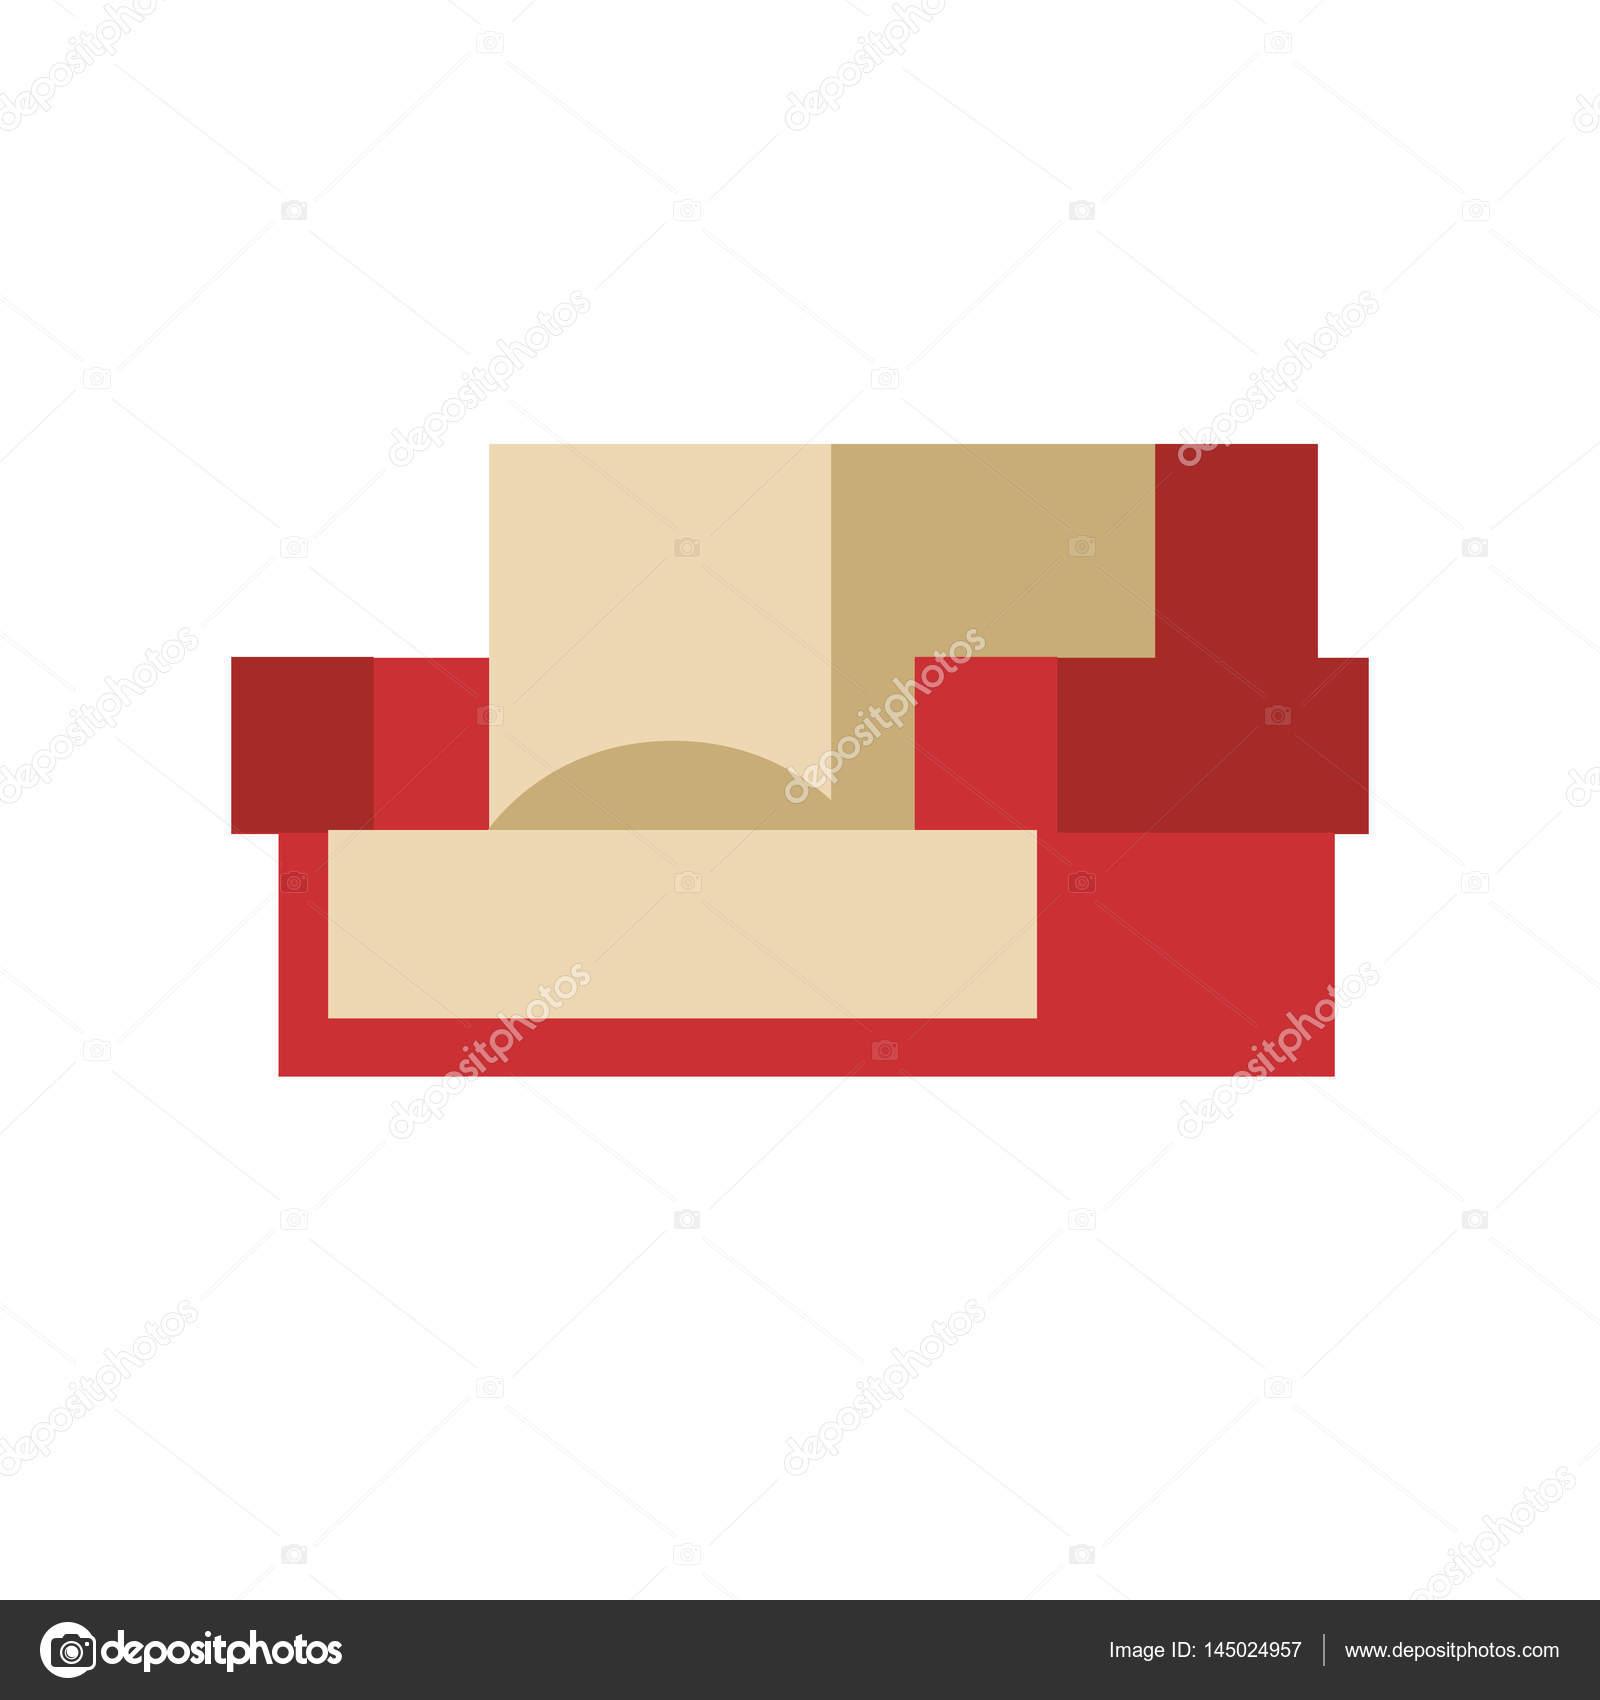 Vektor-Illustration Sofa isoliert isoliert lebende Möbel einfaches ...